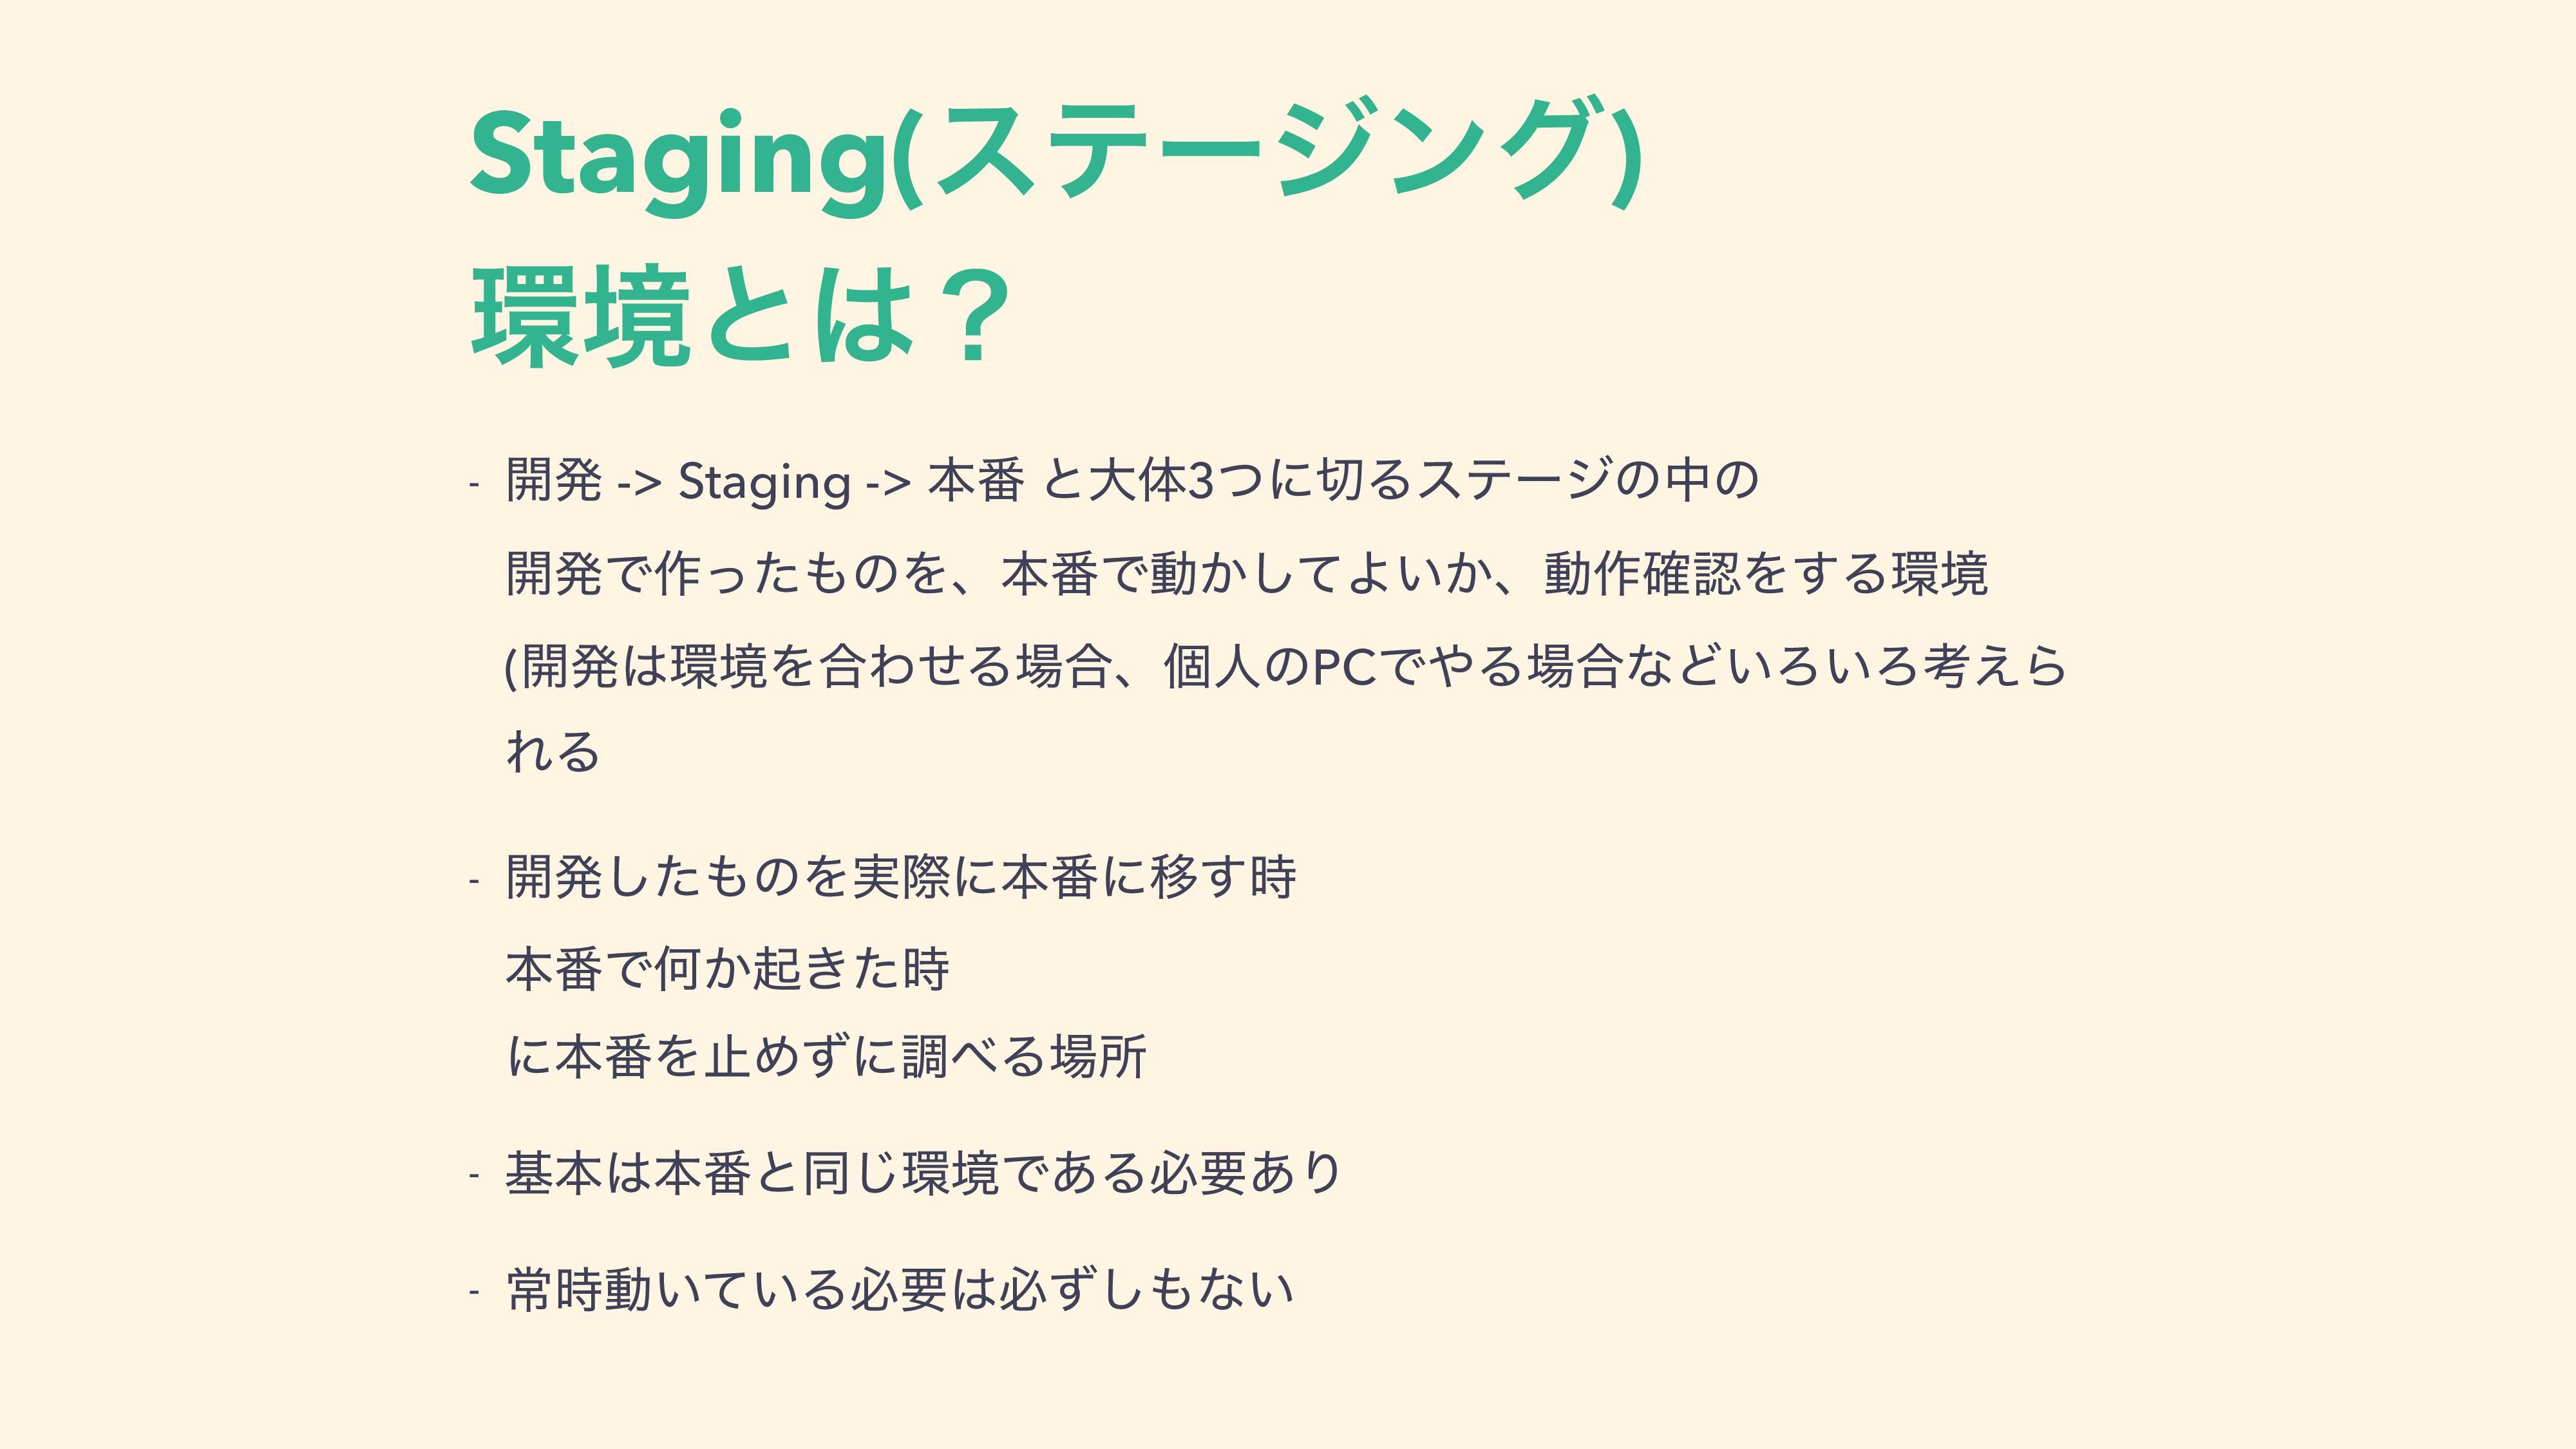 Staging(εςʔδϯά) ڥͱʁ - ։ൃ -> Staging -> ຊ൪ ͱେ...